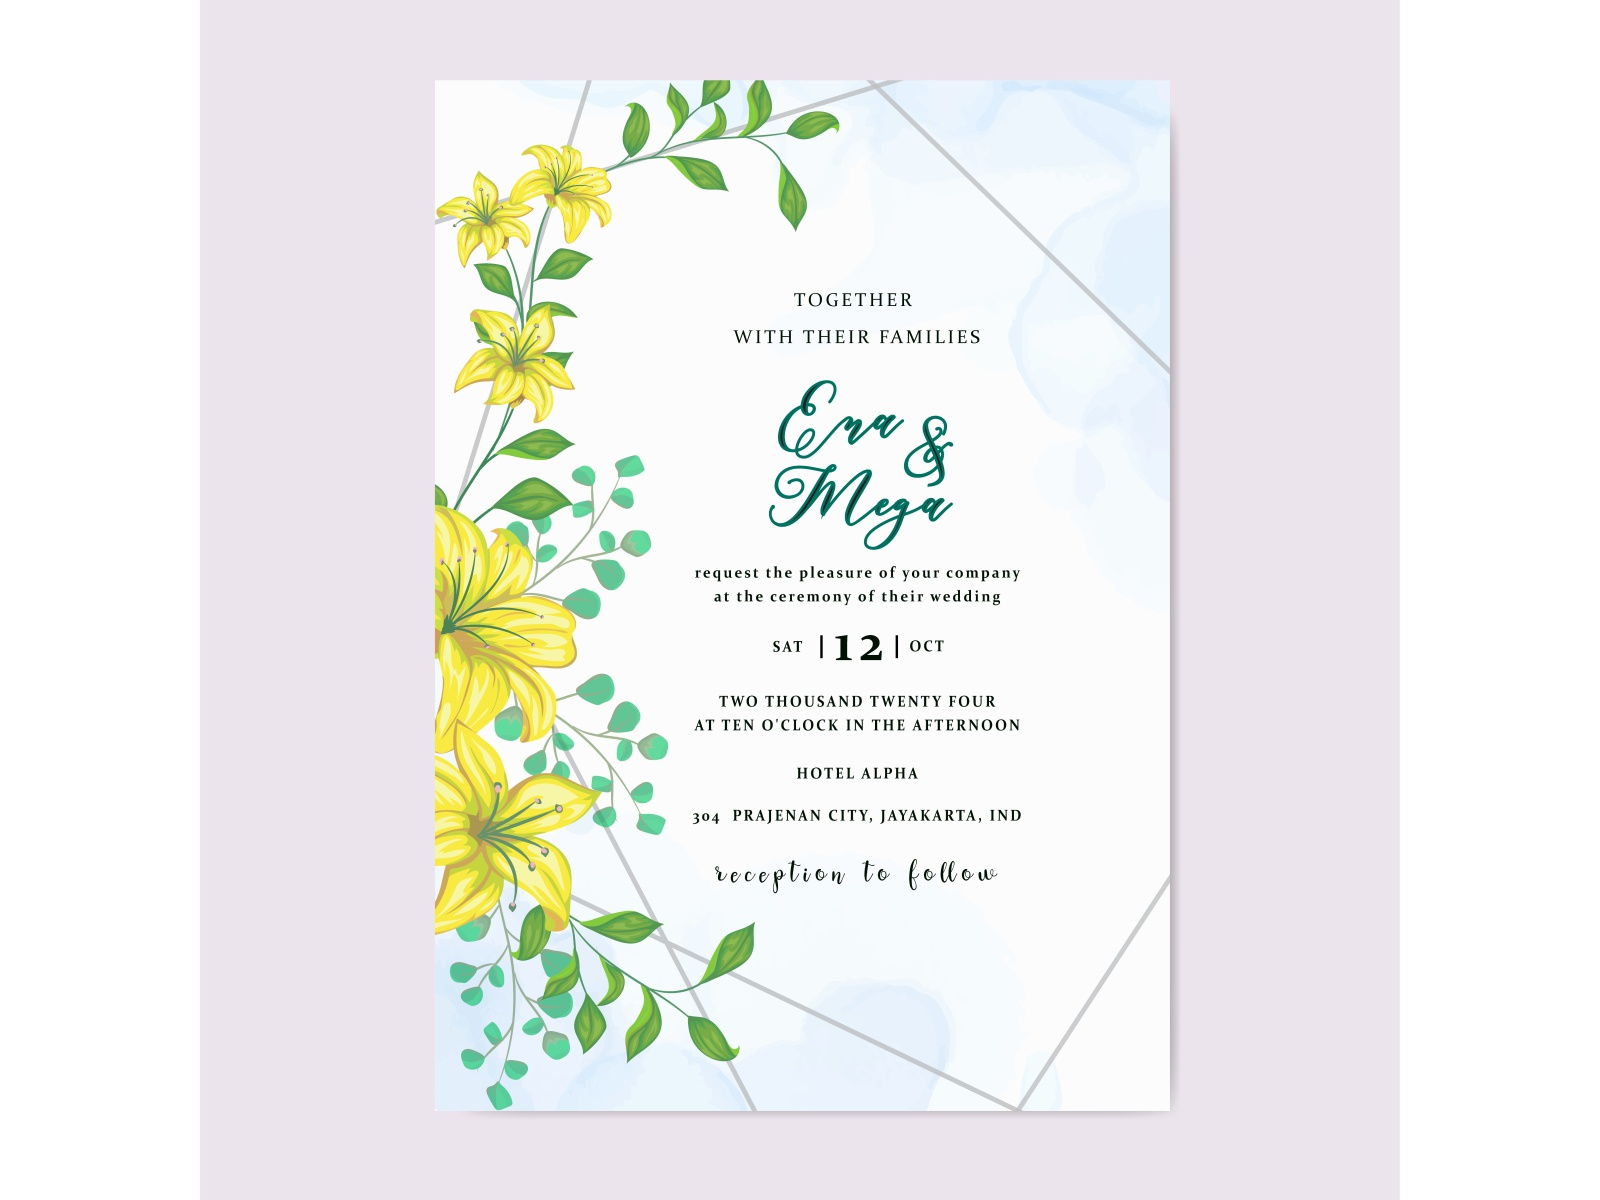 Desain Undangan Pernikahan Jogja